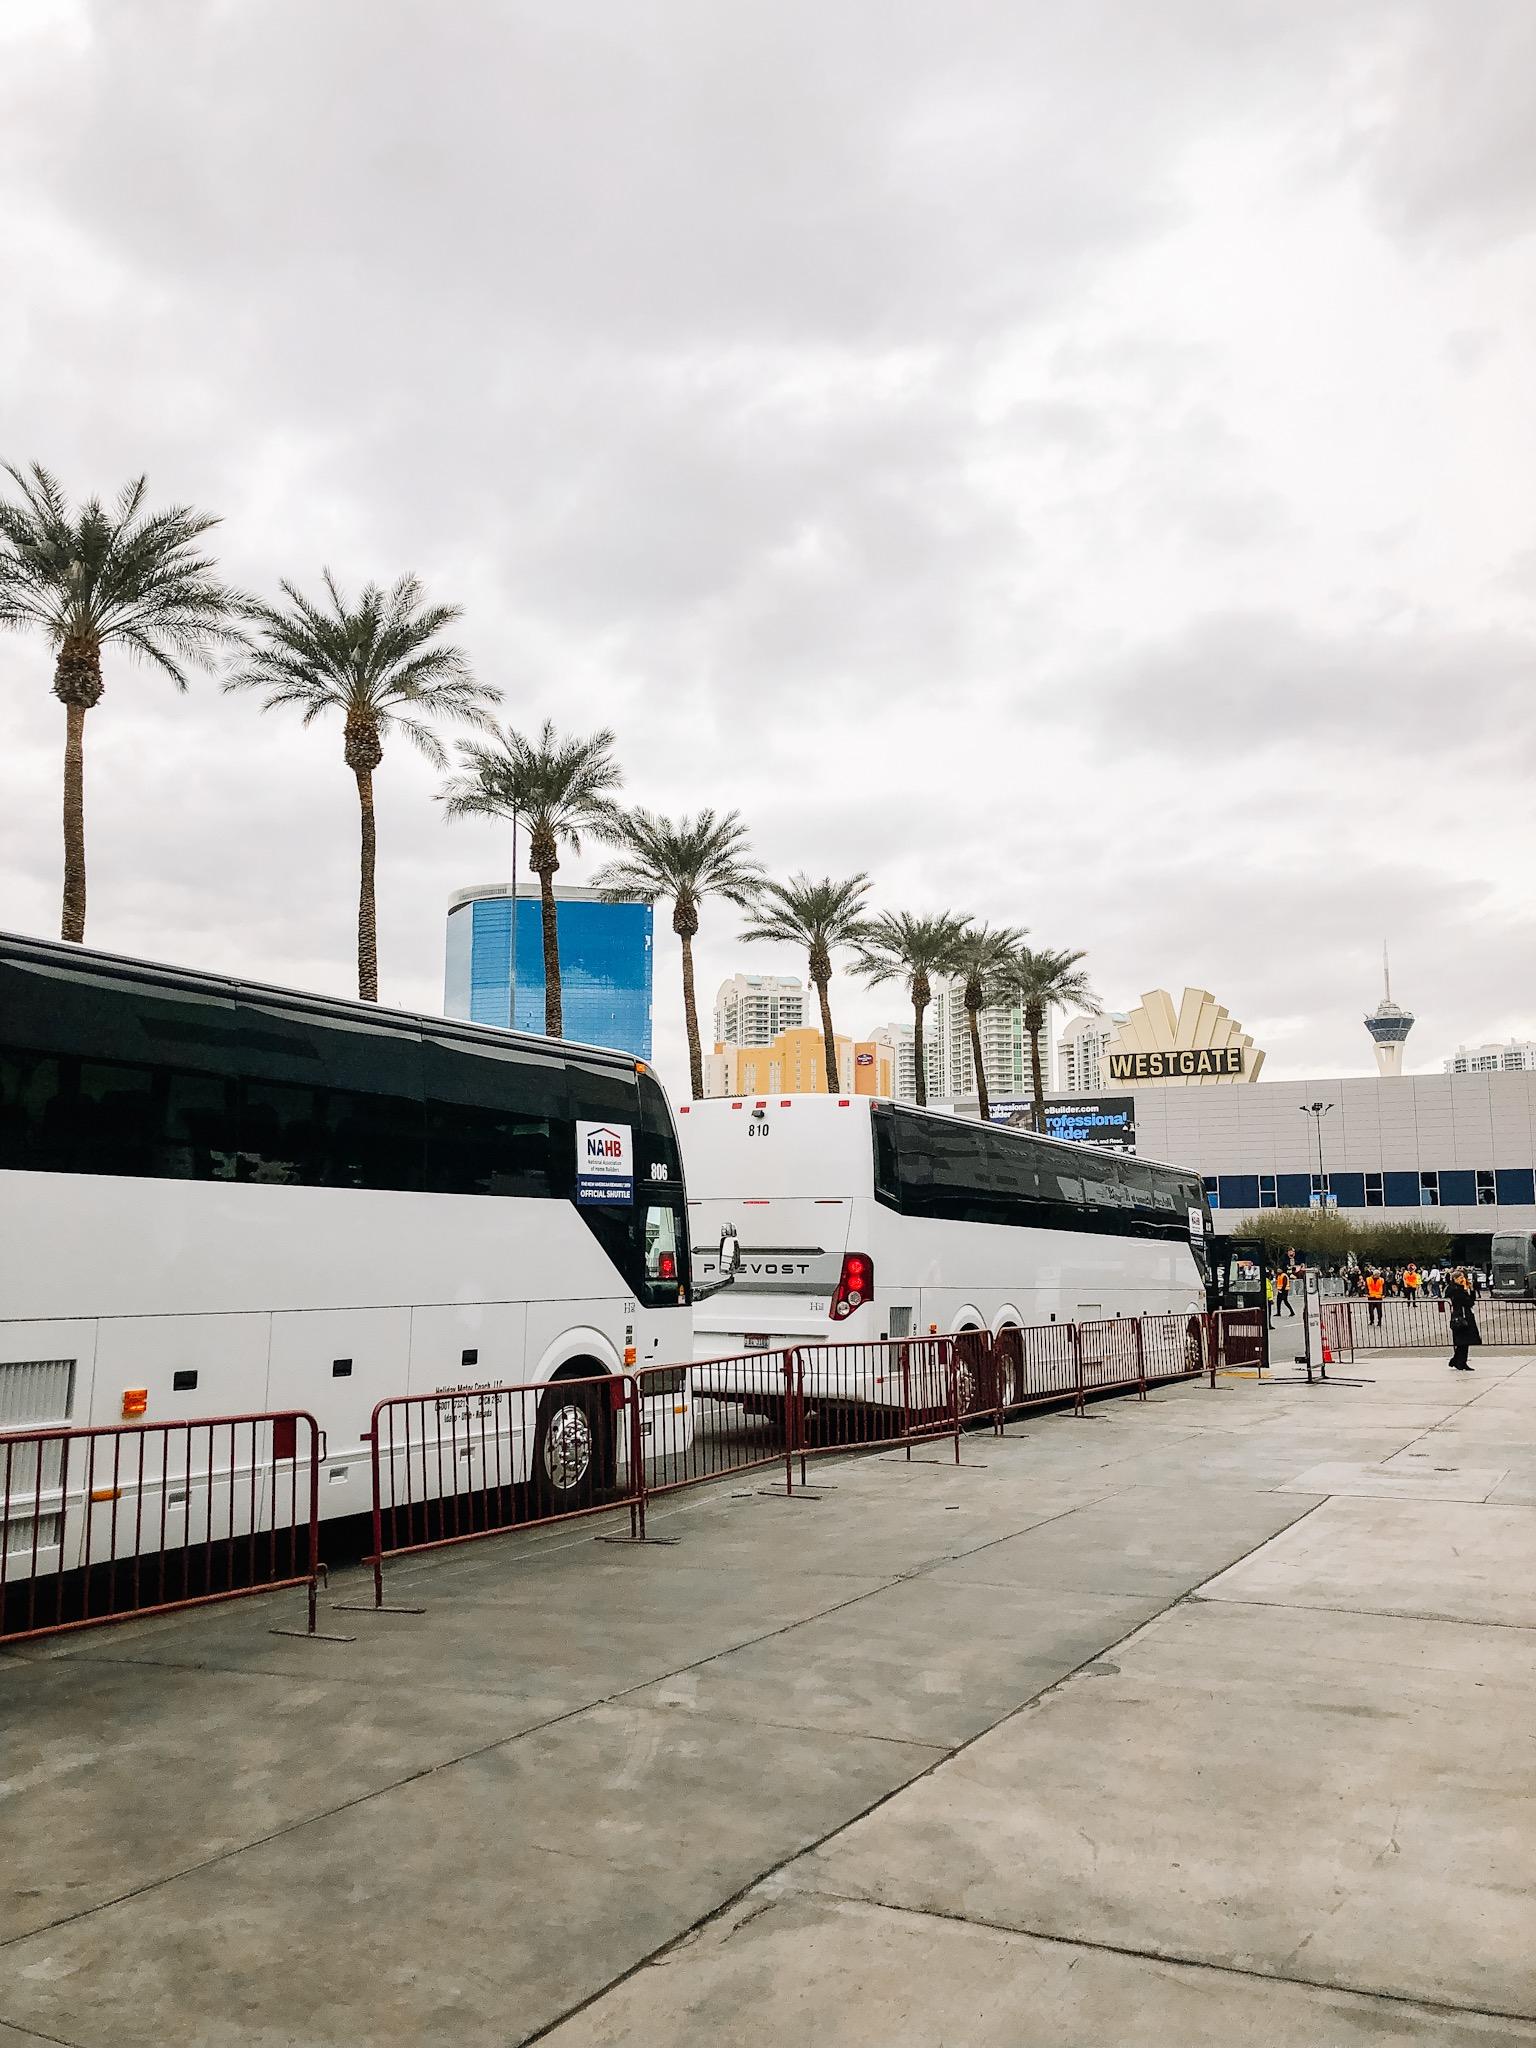 KBIS 2019 - Las Vegas, Nevada